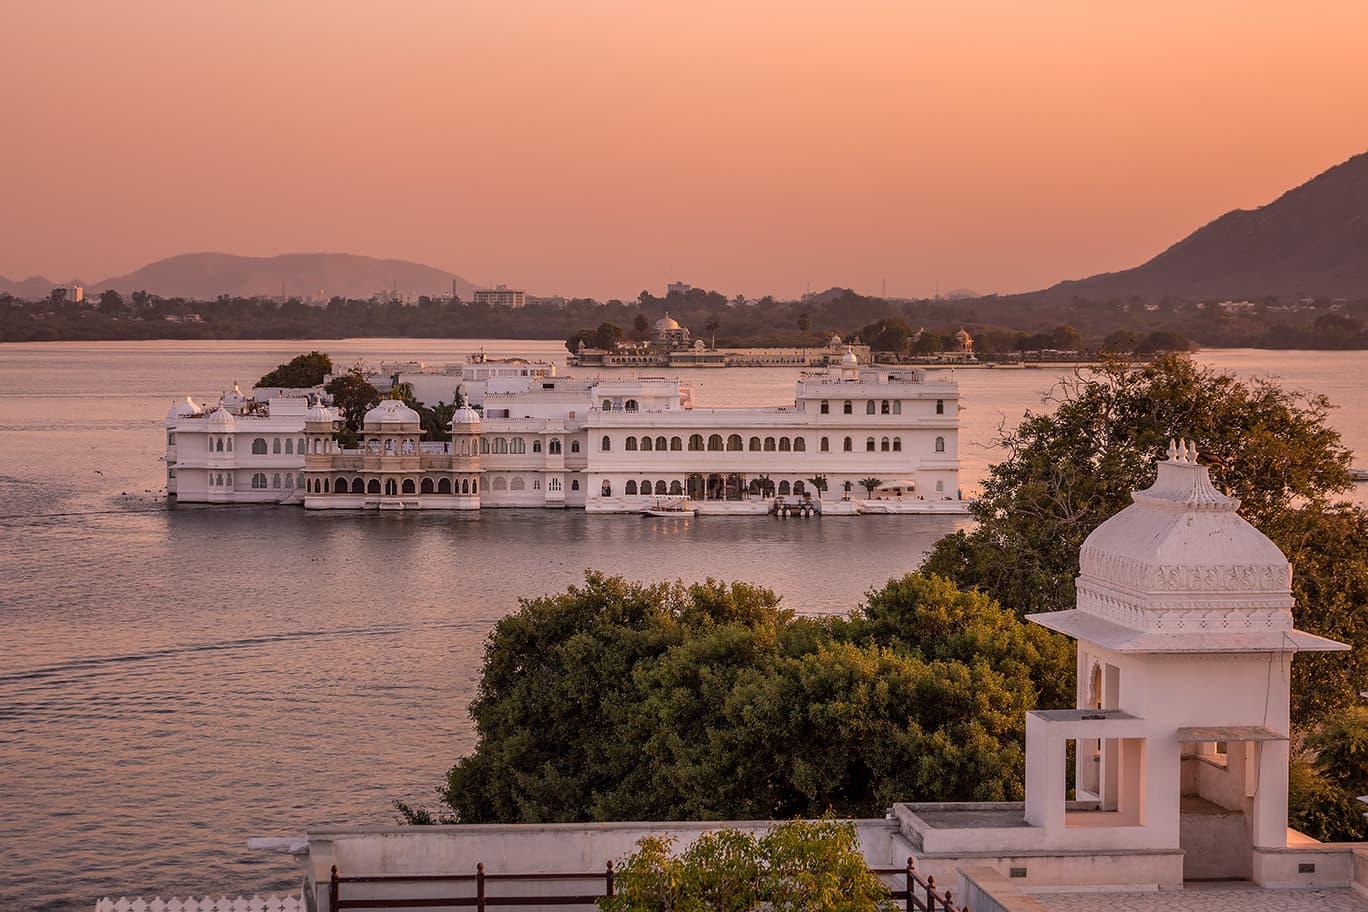 ehl-taj-lake-palace